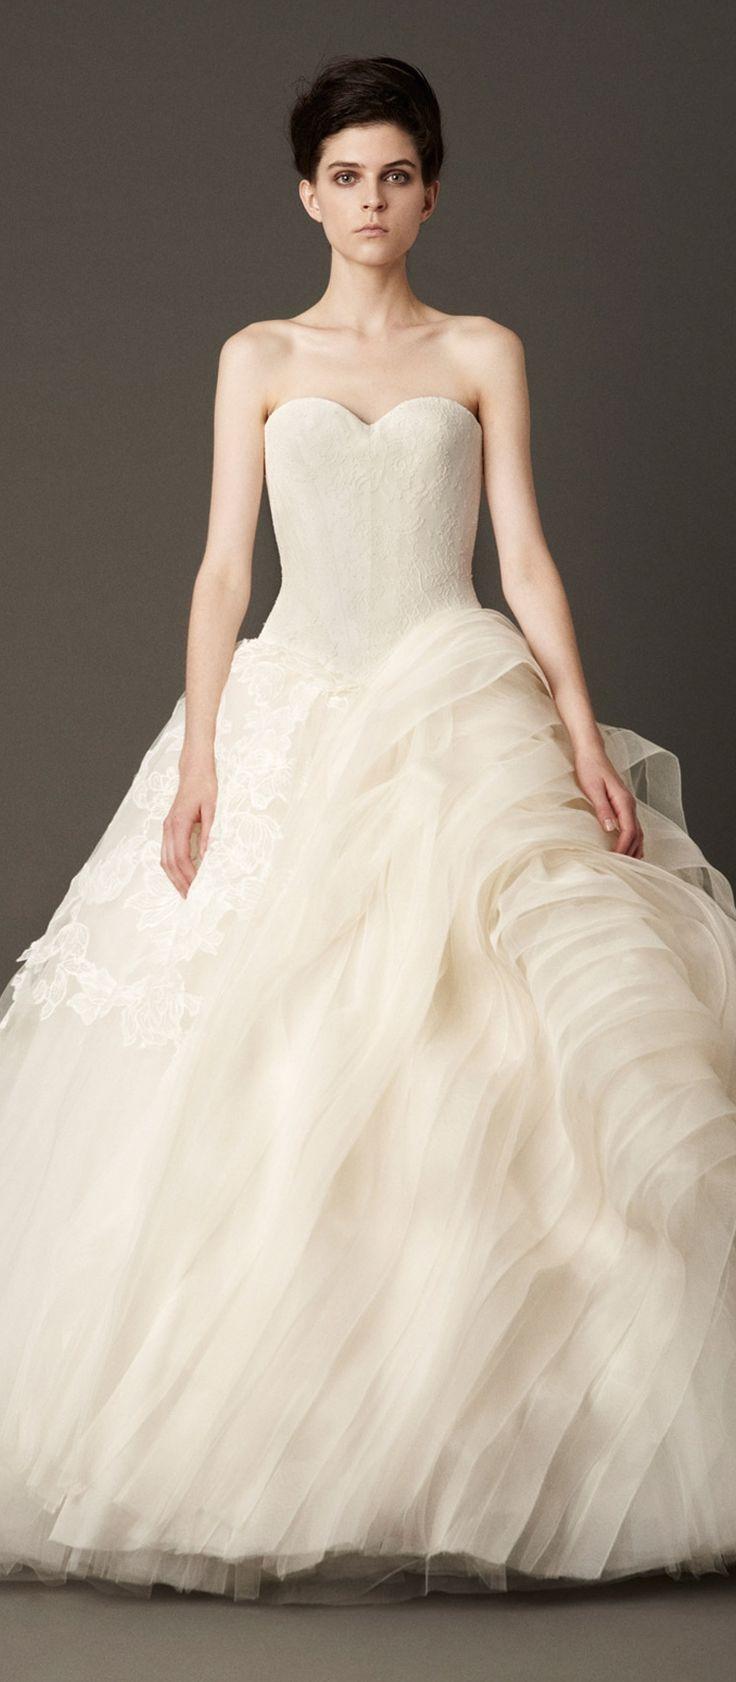 21 best Vera Wang Lara images on Pinterest | Vera wang, Wedding ...